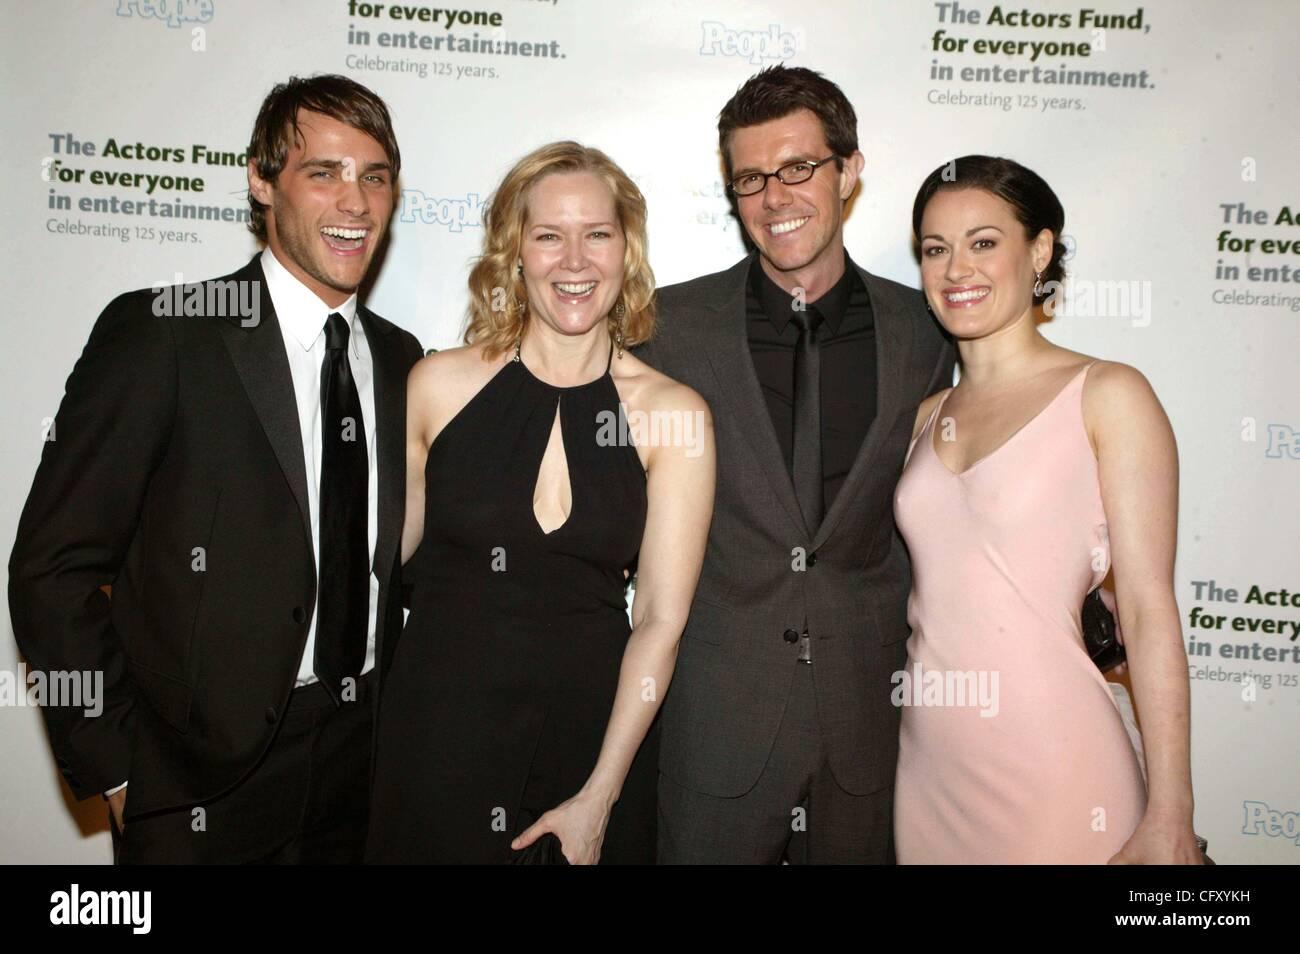 Apr. 30, 2007 - New York, New York, U.S. - The Actors Fund celebrates their 125th anniversary at the Waldorf - Astoria Stock Photo